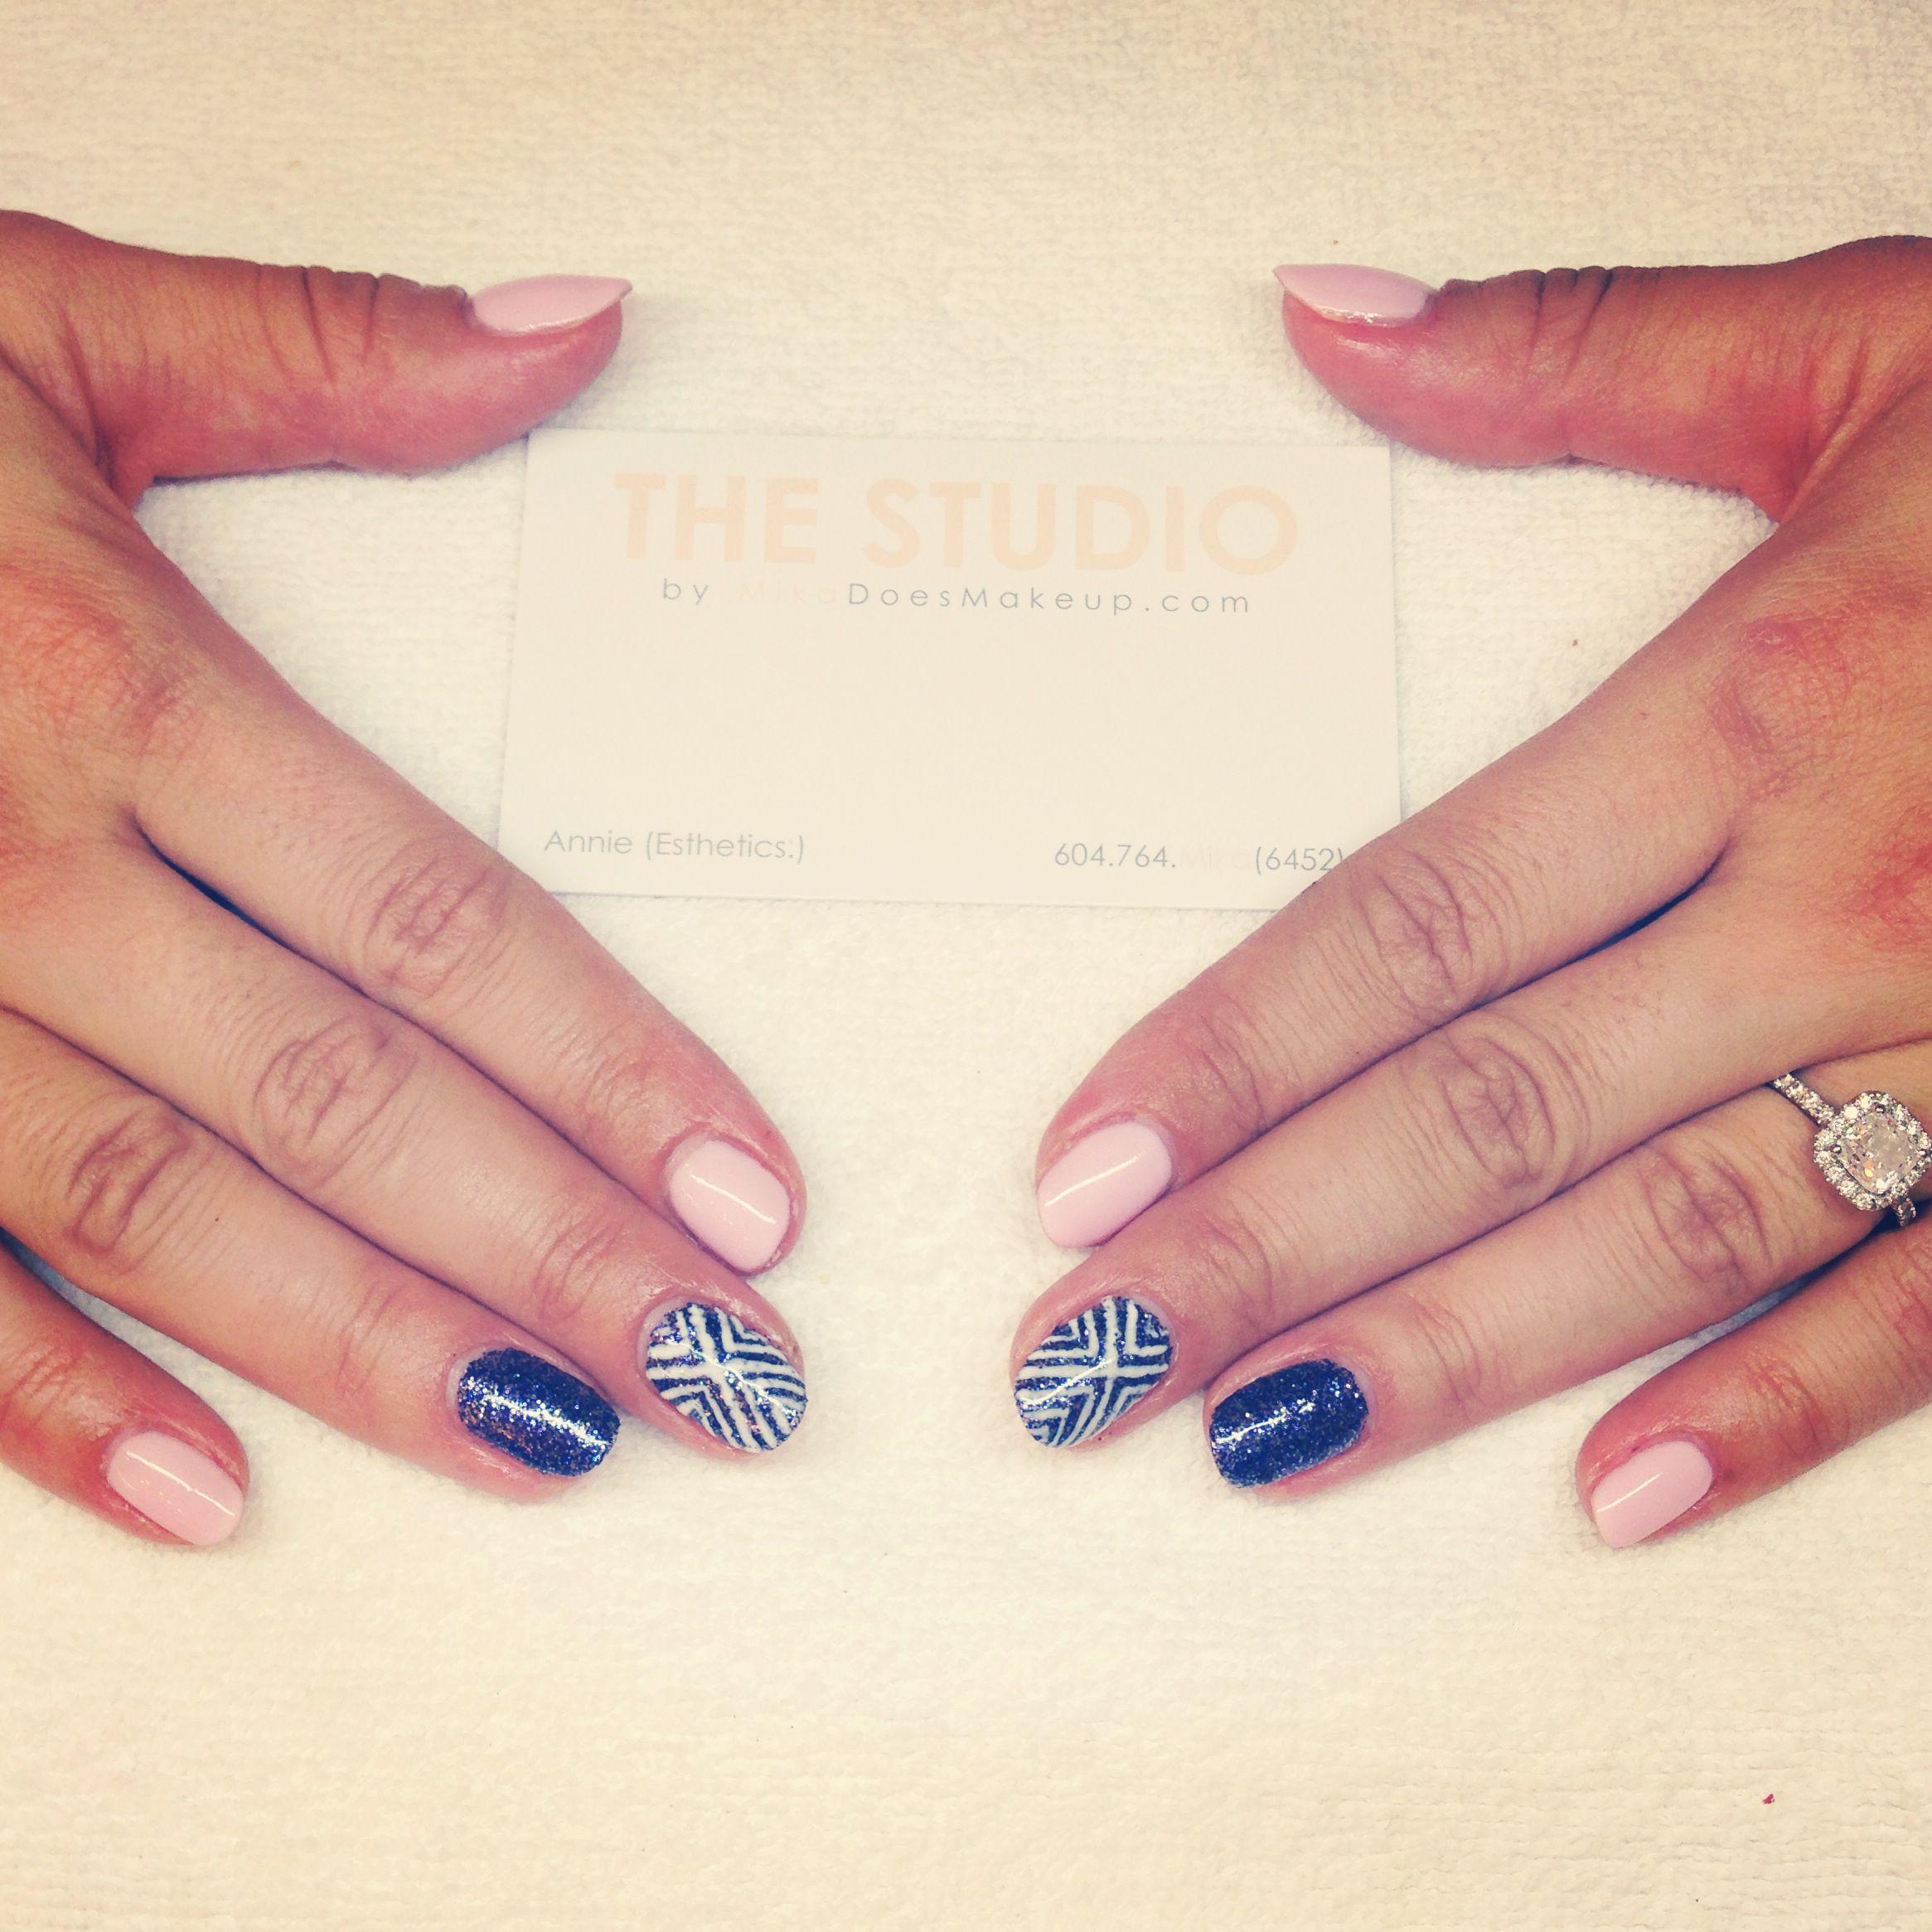 Aztec nail design with purple glitter   Nail Designs   Pinterest ...